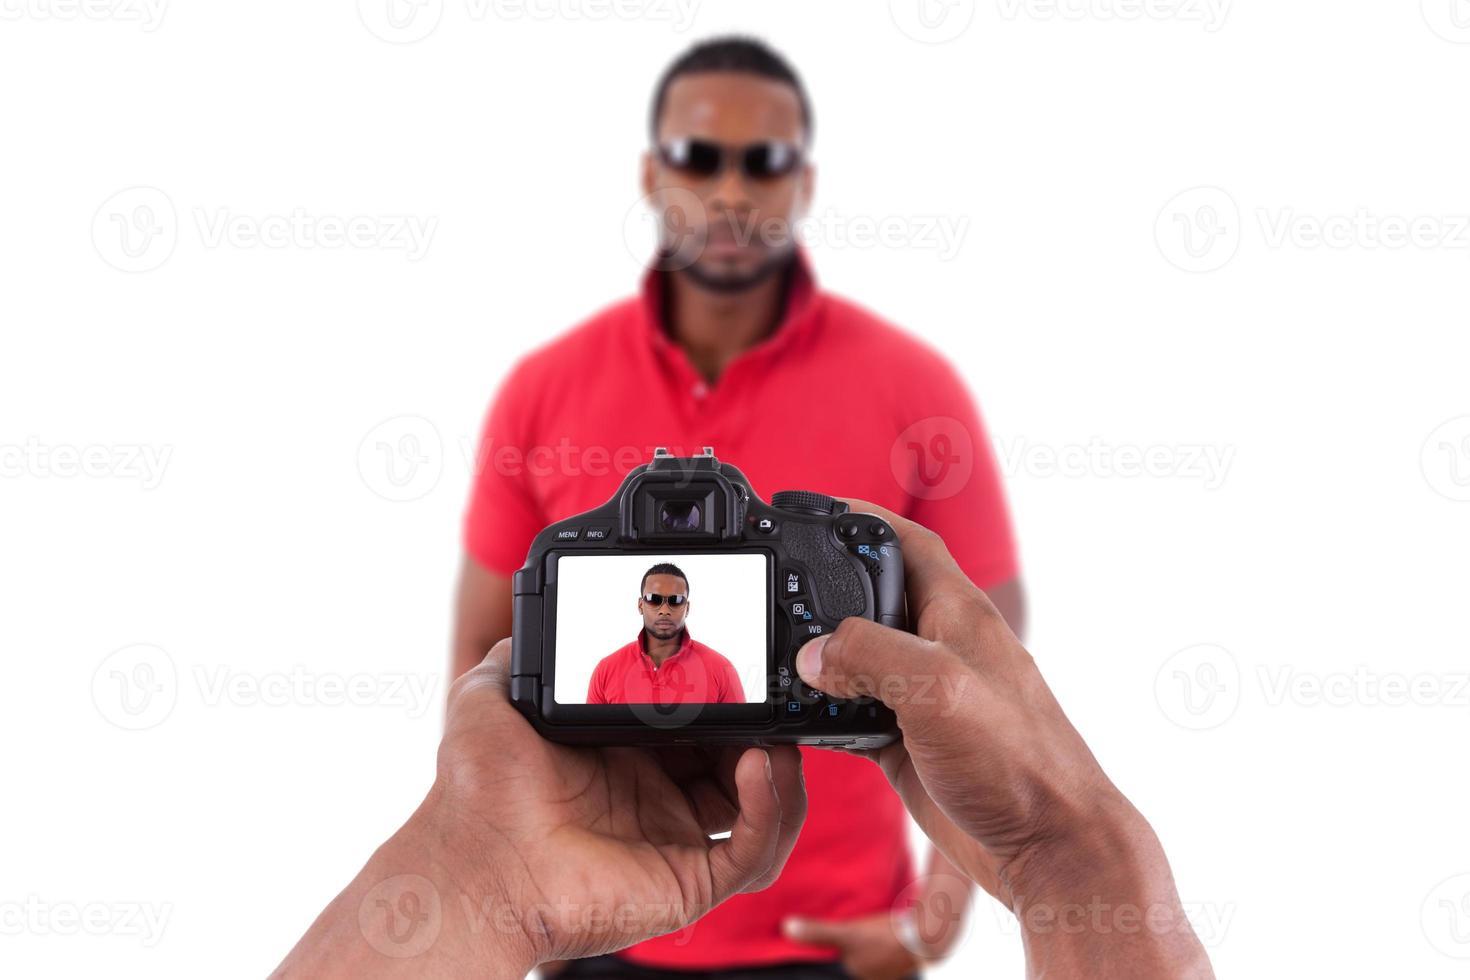 fotógrafo americano africano tirando fotos de estúdio